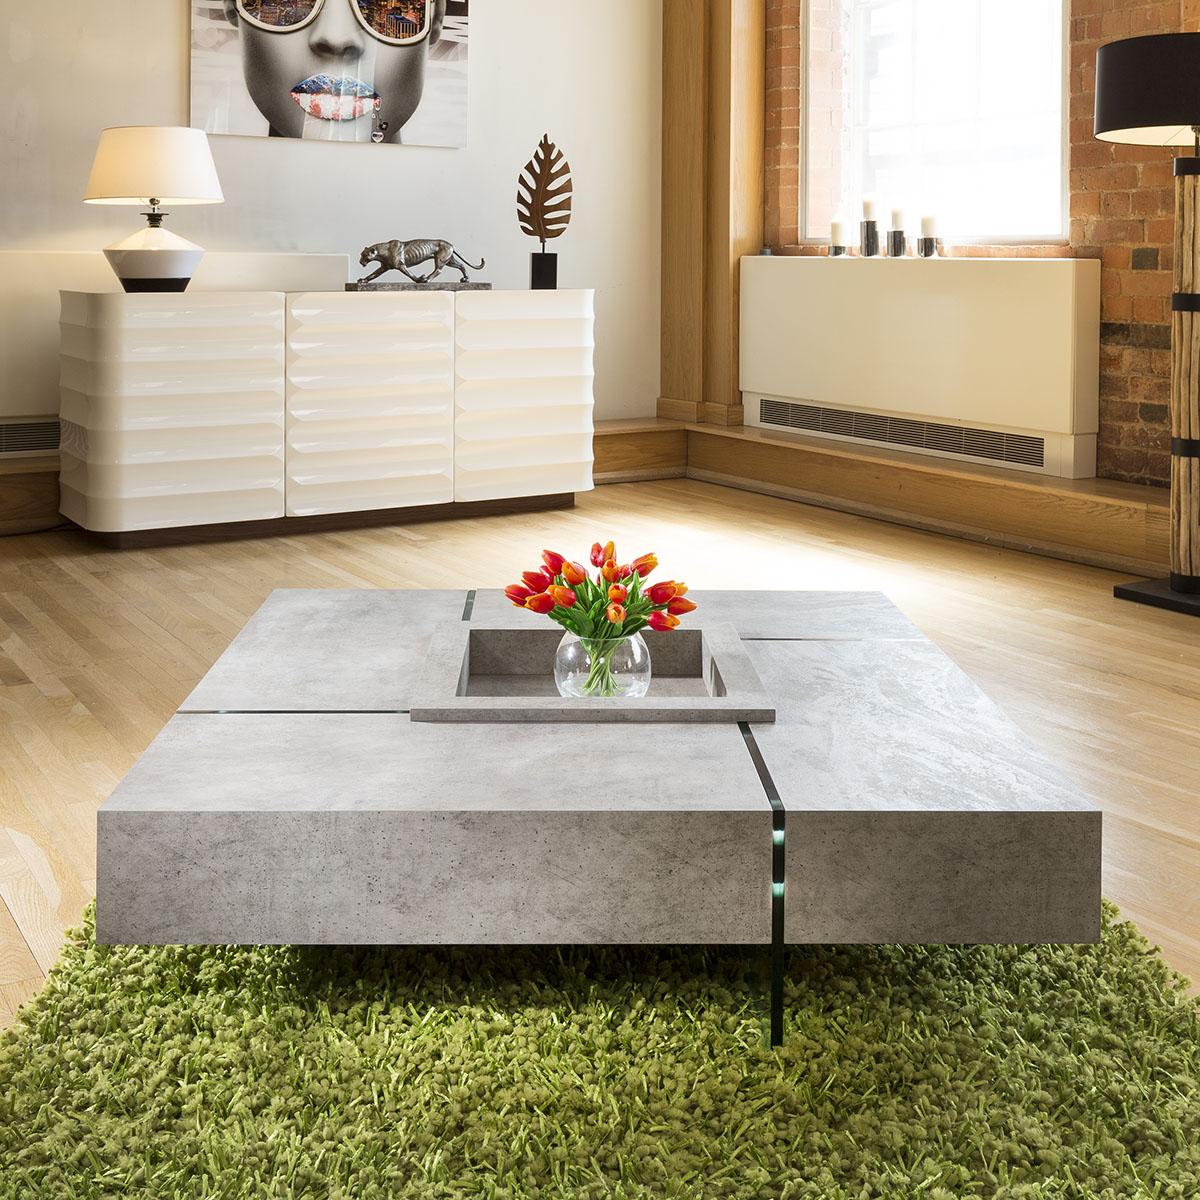 Quatropi Modern Large Square Concrete Coffee Table 1194 X 1194 X